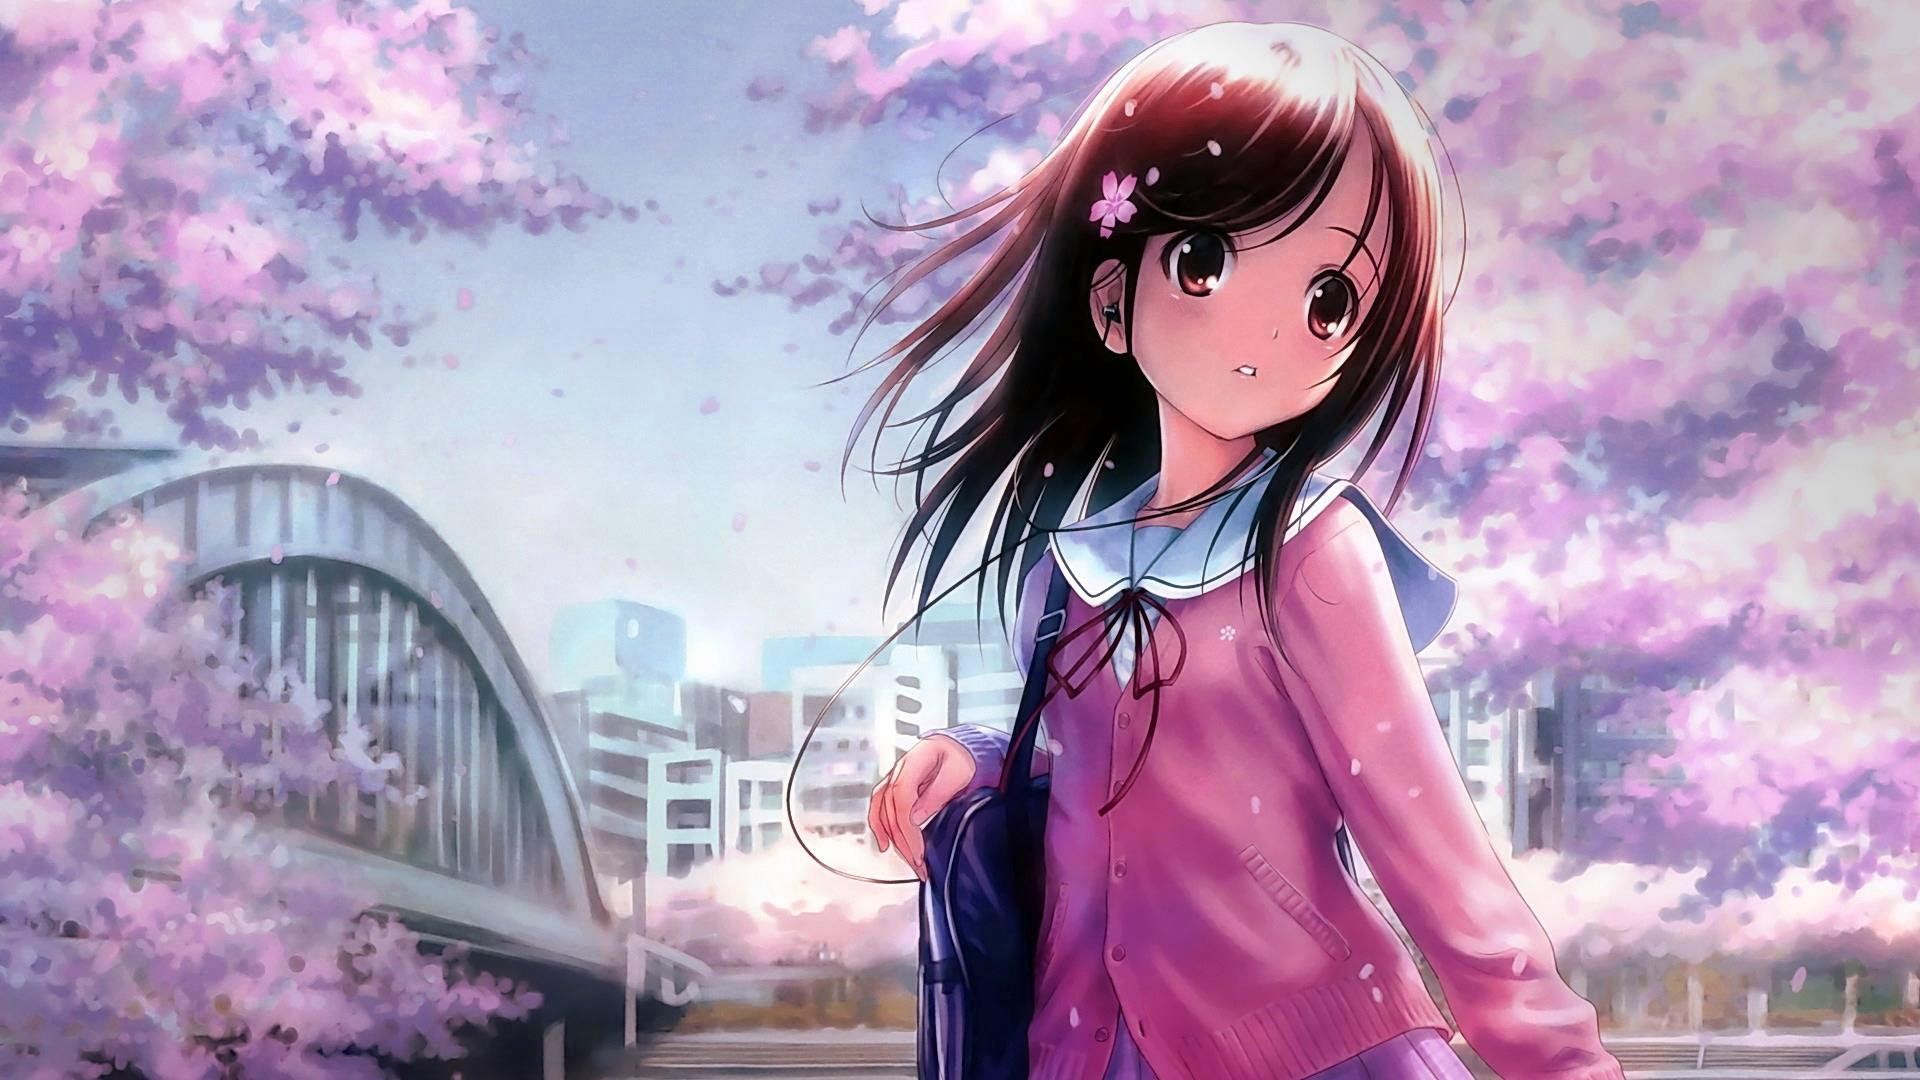 Japanese Girl Anime Wallpapers Top Free Japanese Girl Anime